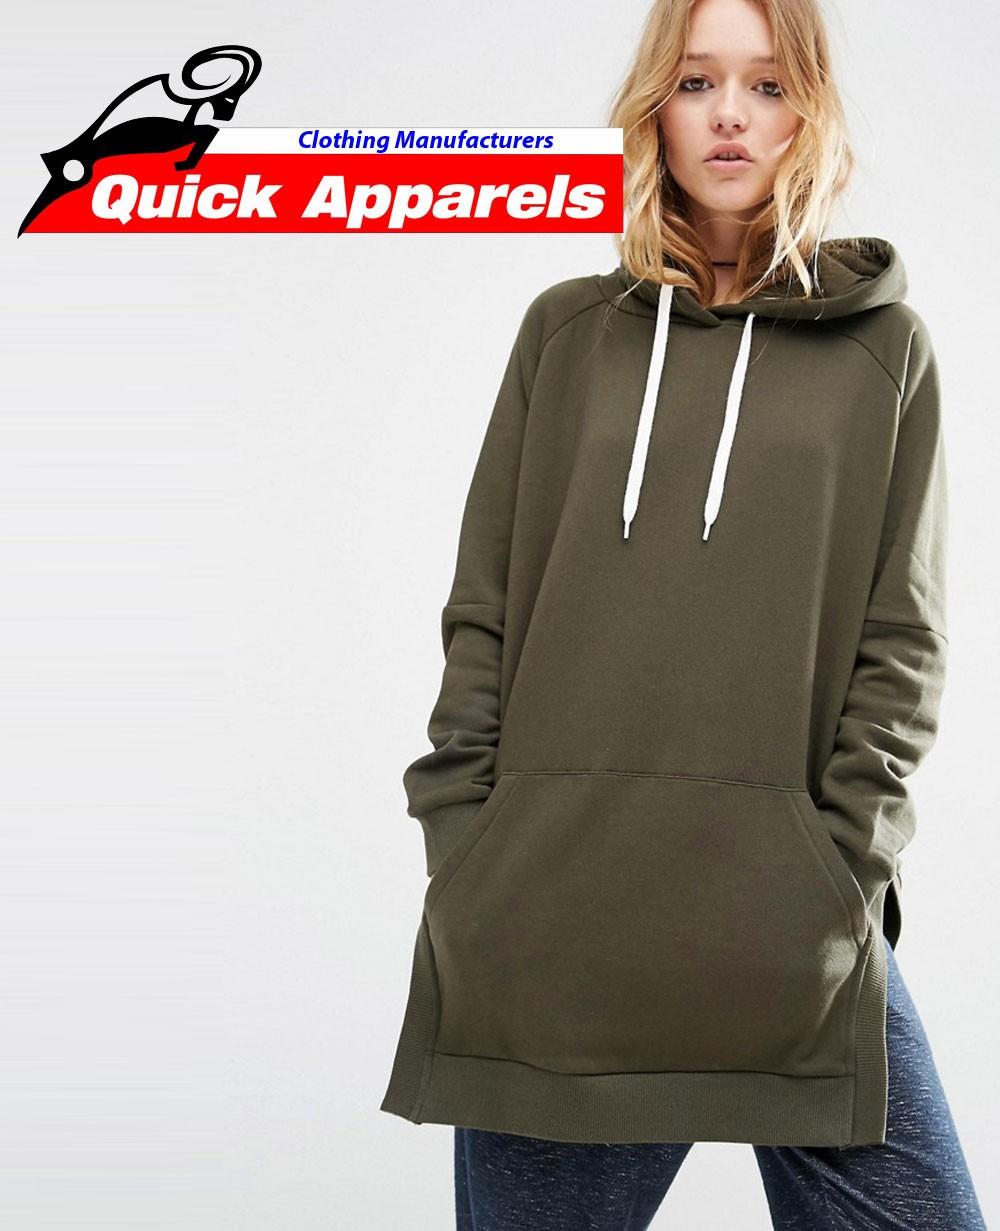 Pullover Women Hoodie in Longline Oversized Fit with Side Splits 9683c909d